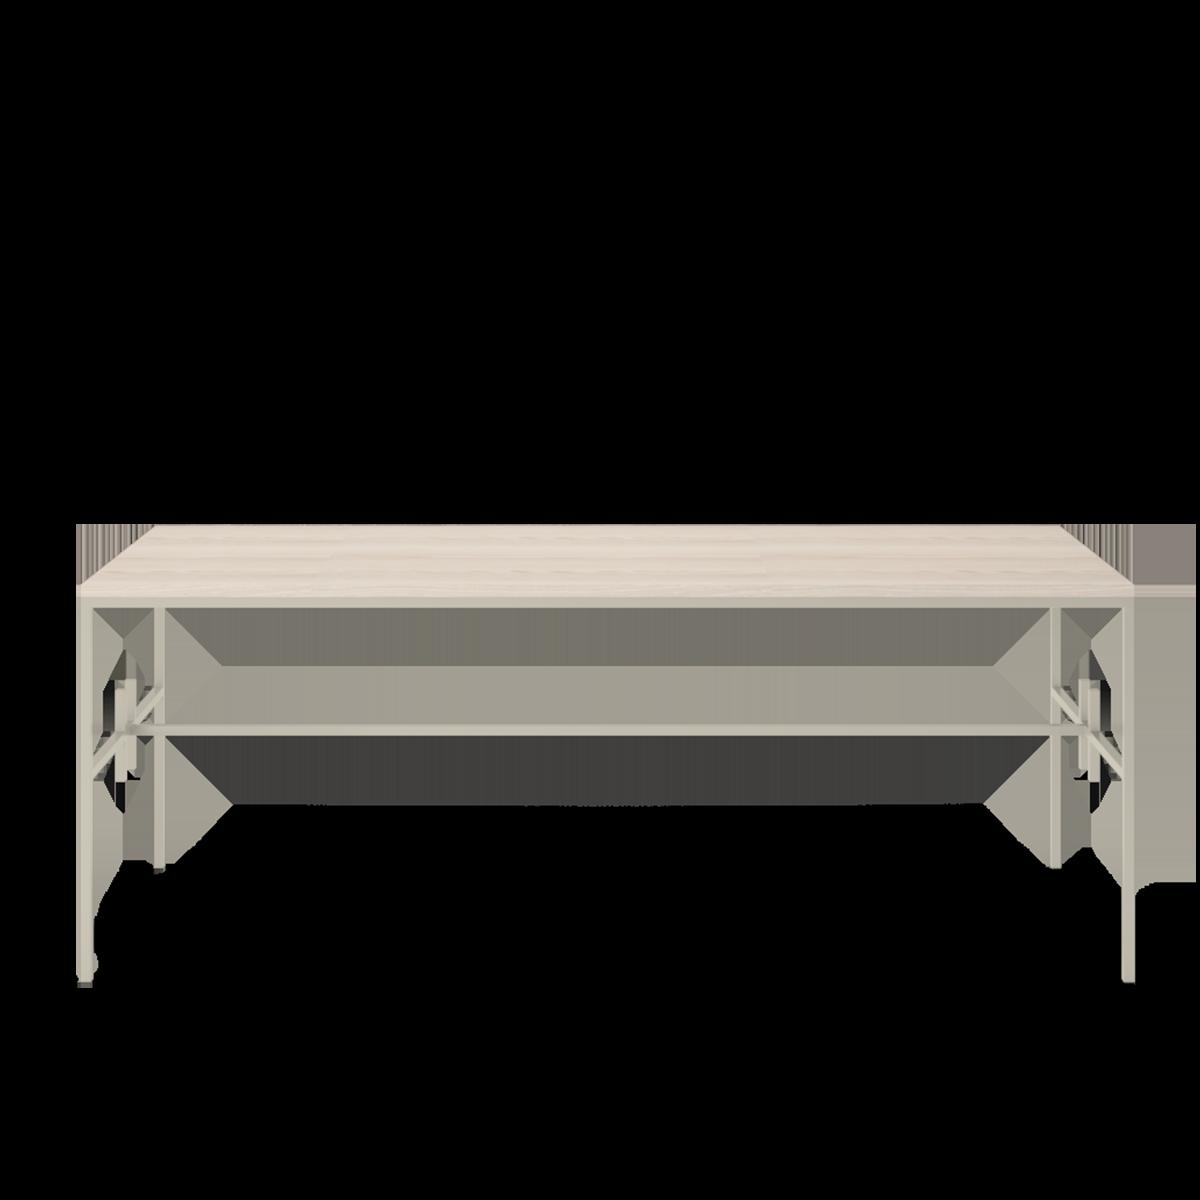 H-table - Efva Attling - The Högdalen collection